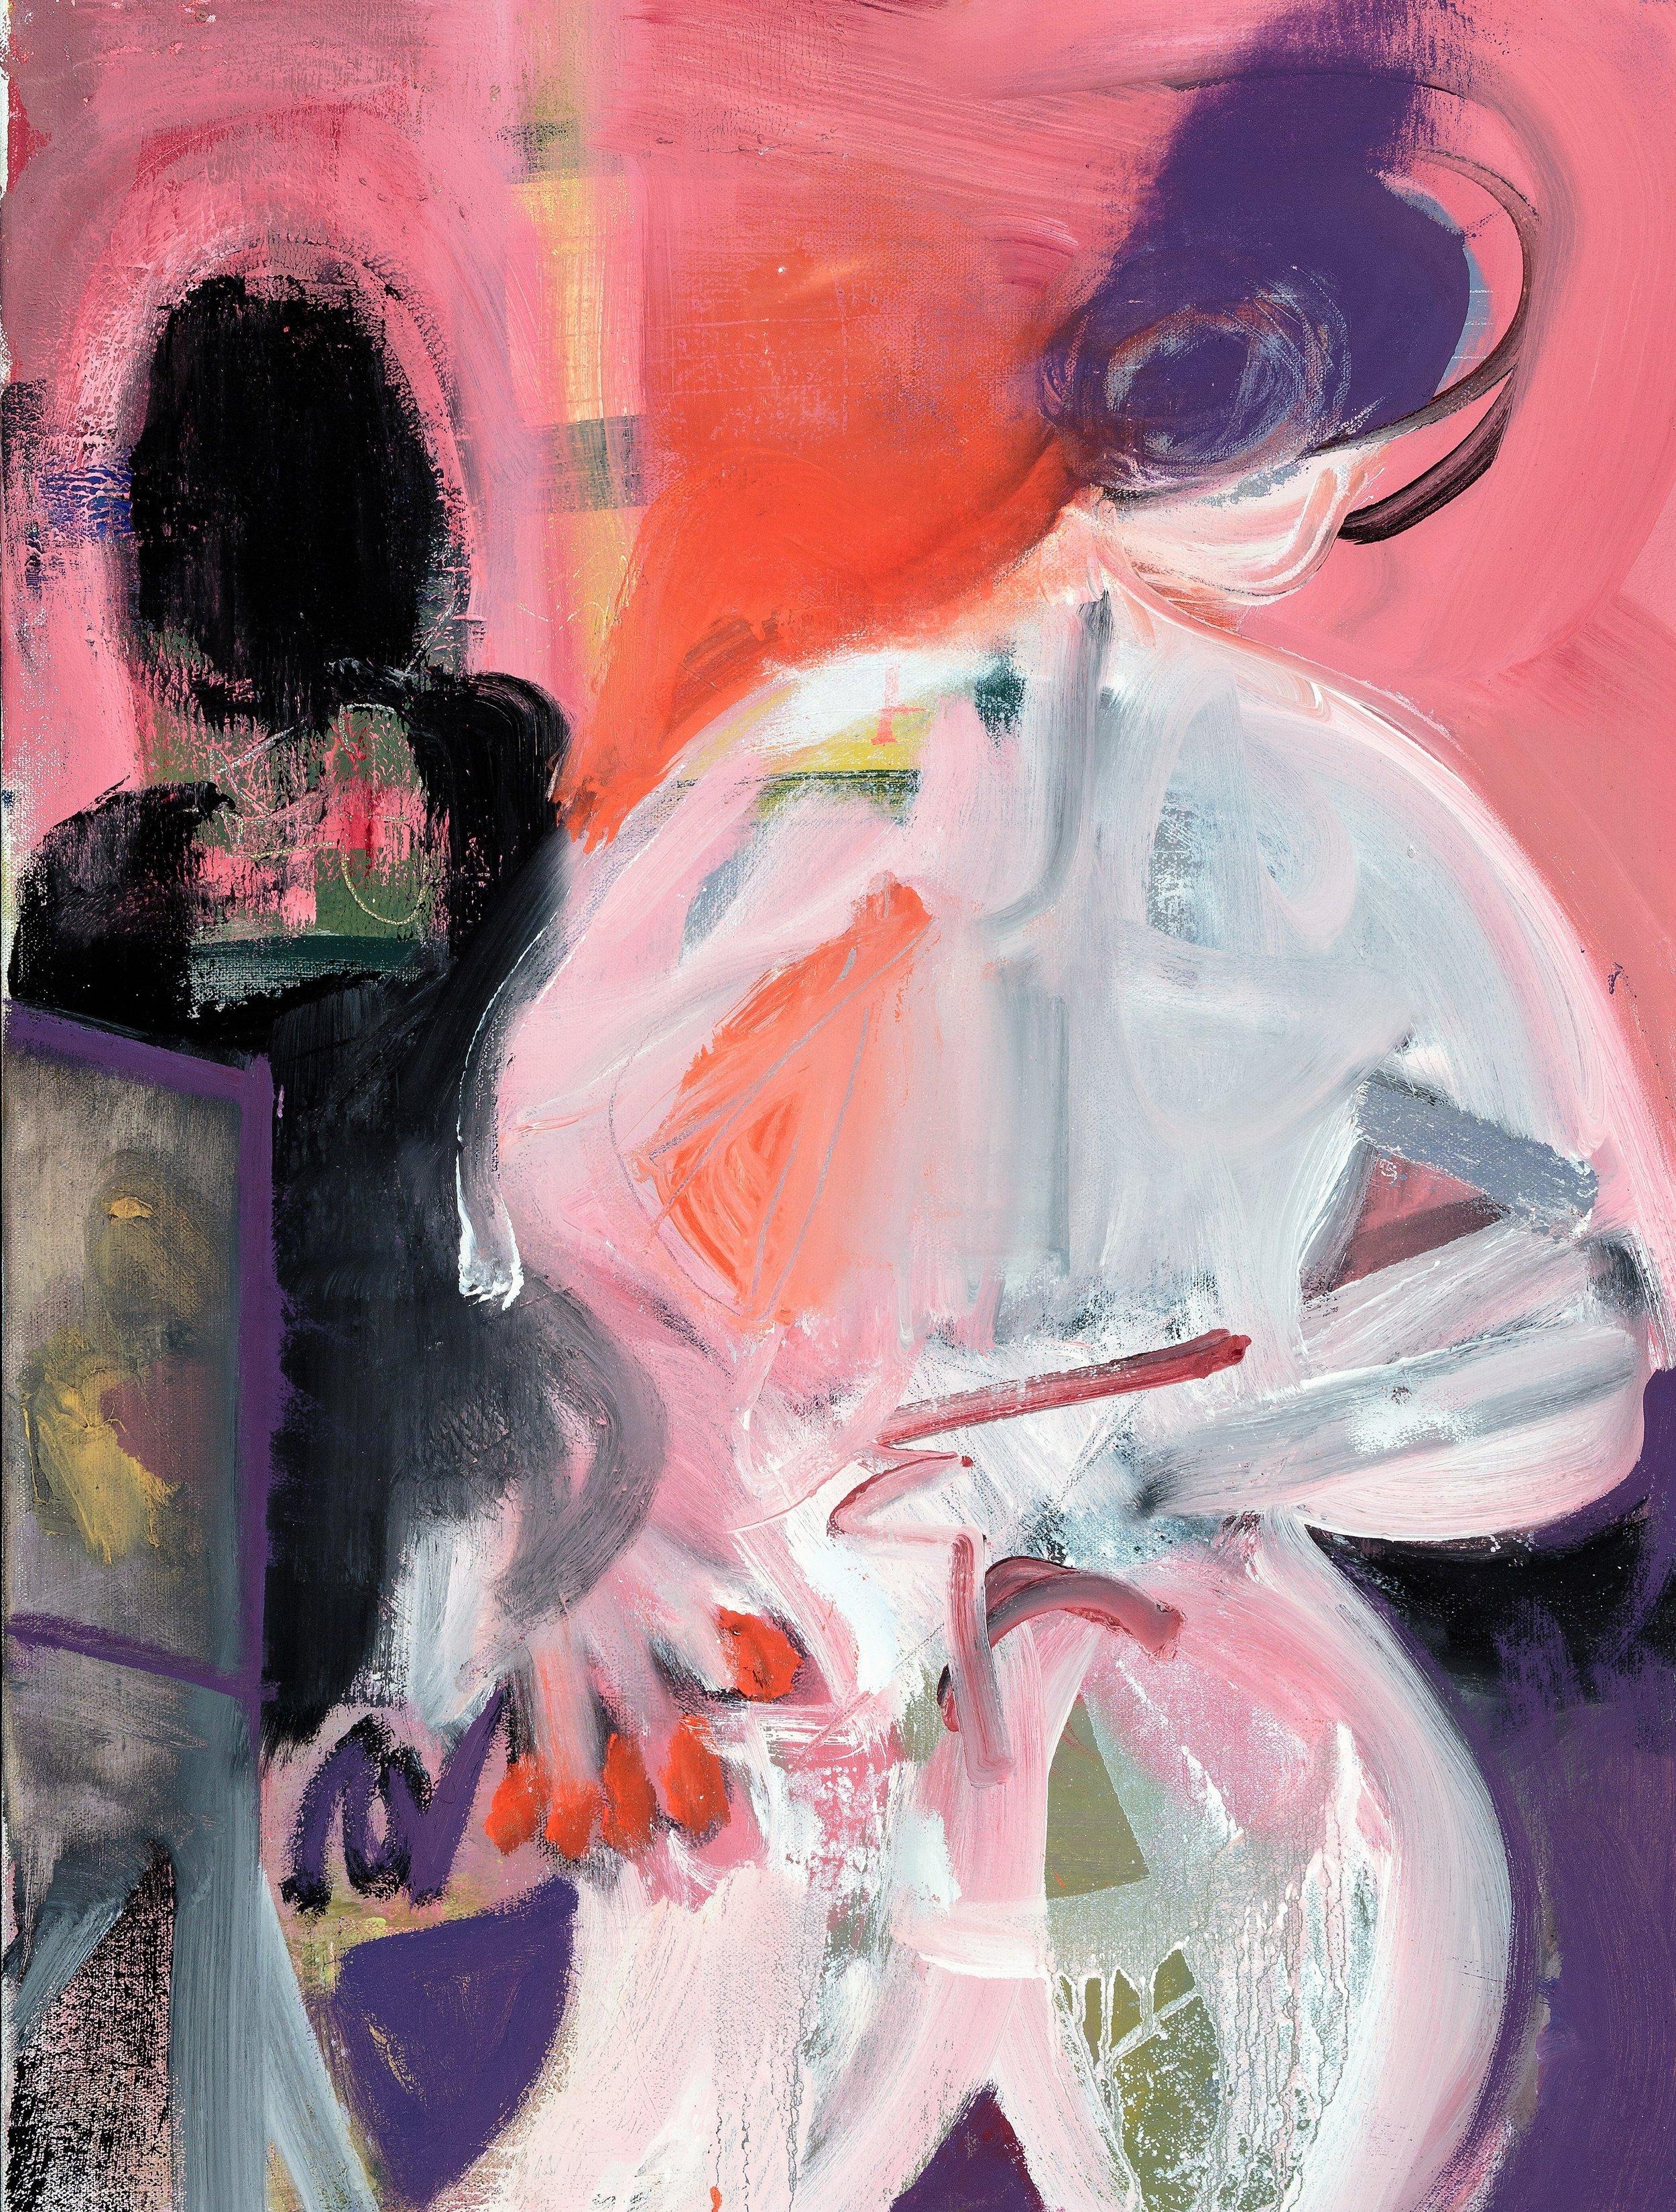 "#4, 2017, Oil on Canvas, 24 x 18"""